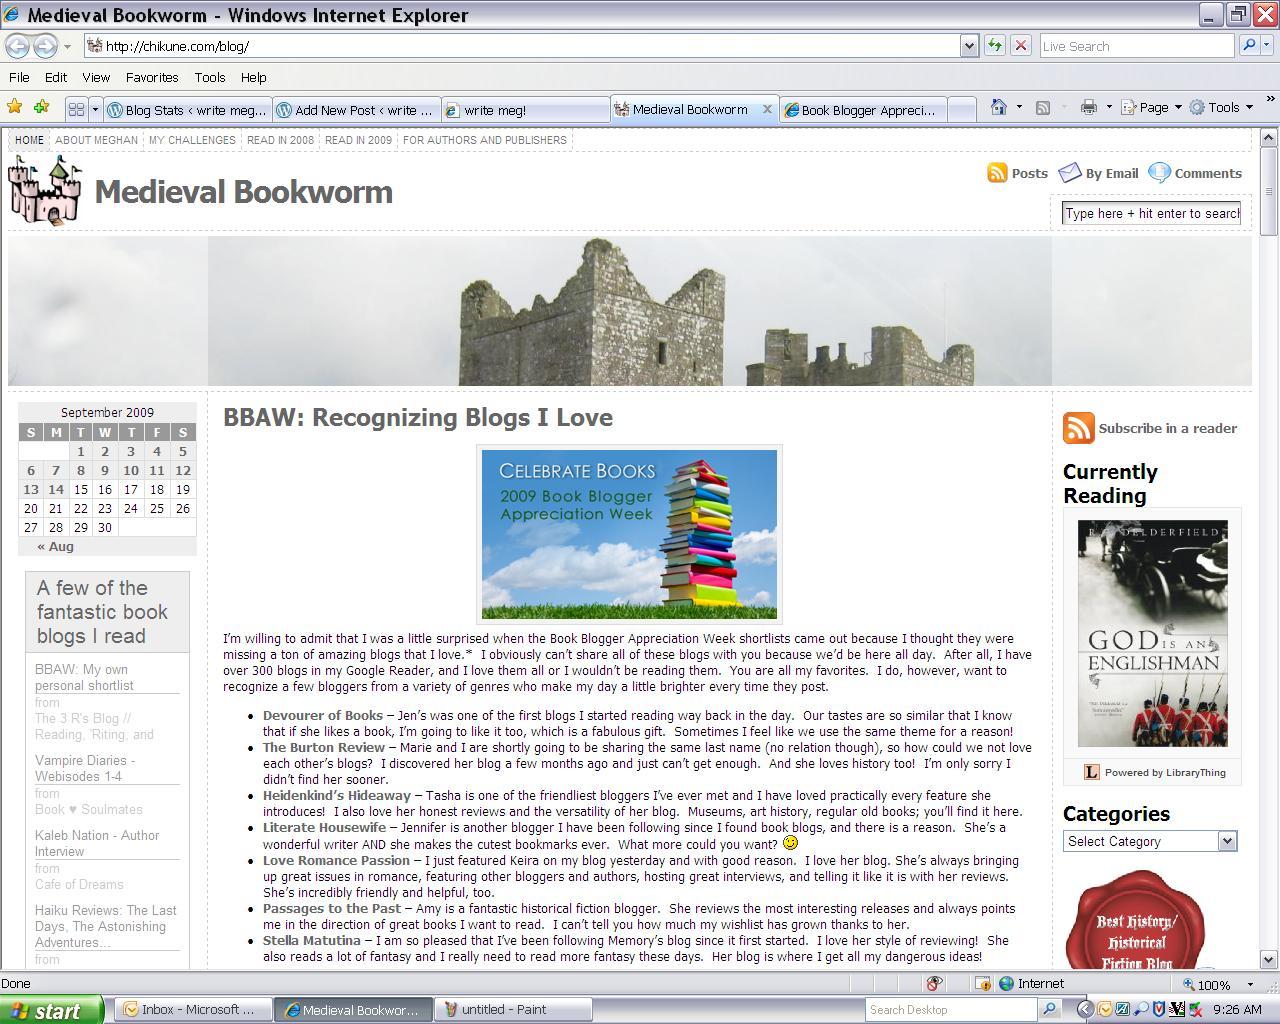 medieval_bookworm